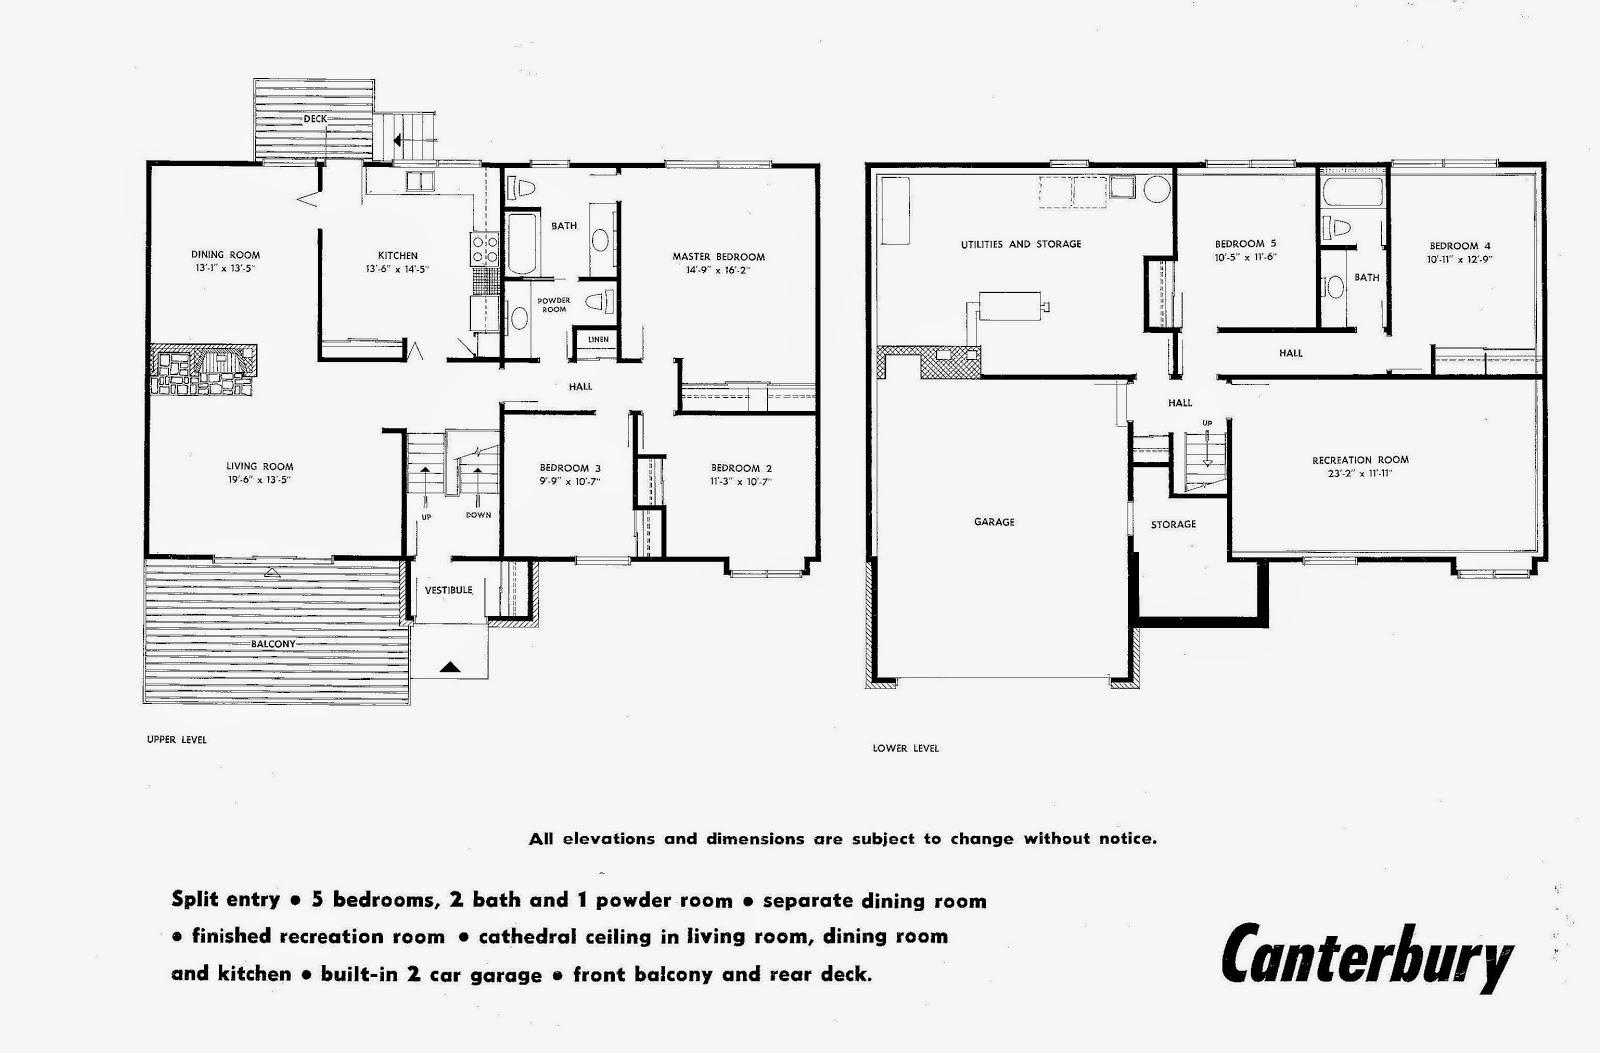 MidCentury Modern and 1970sEra Ottawa July 2014 – Marlborough House Floor Plan